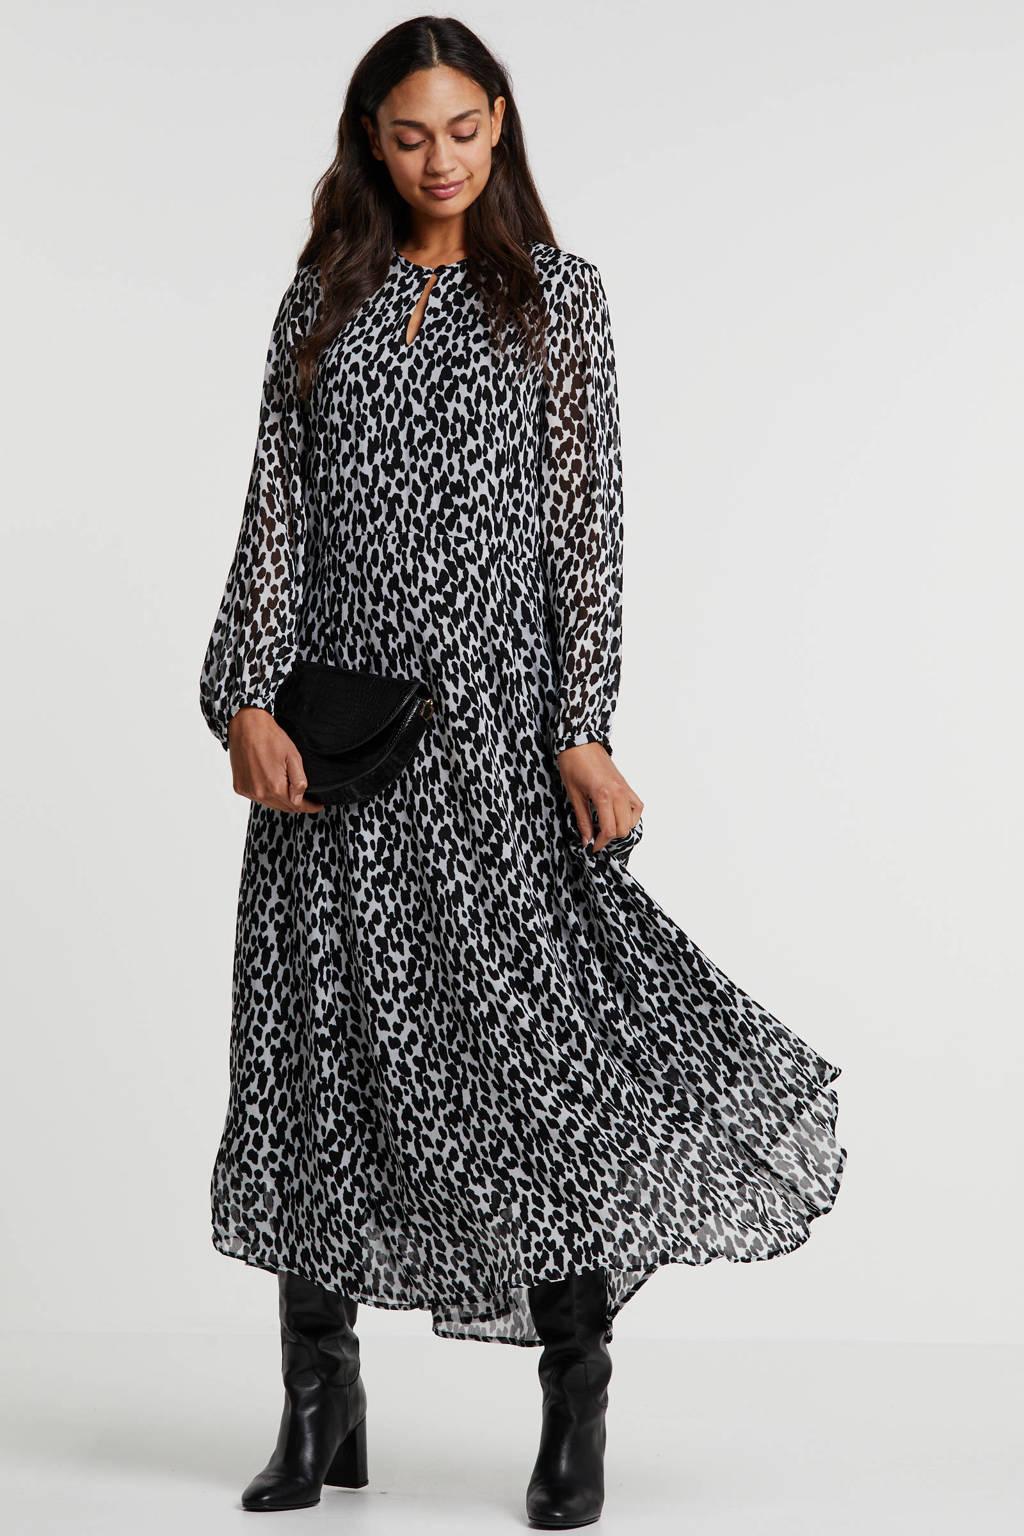 Inwear semi-transparante maxi jurk met all over print wit/zwart, Wit/zwart